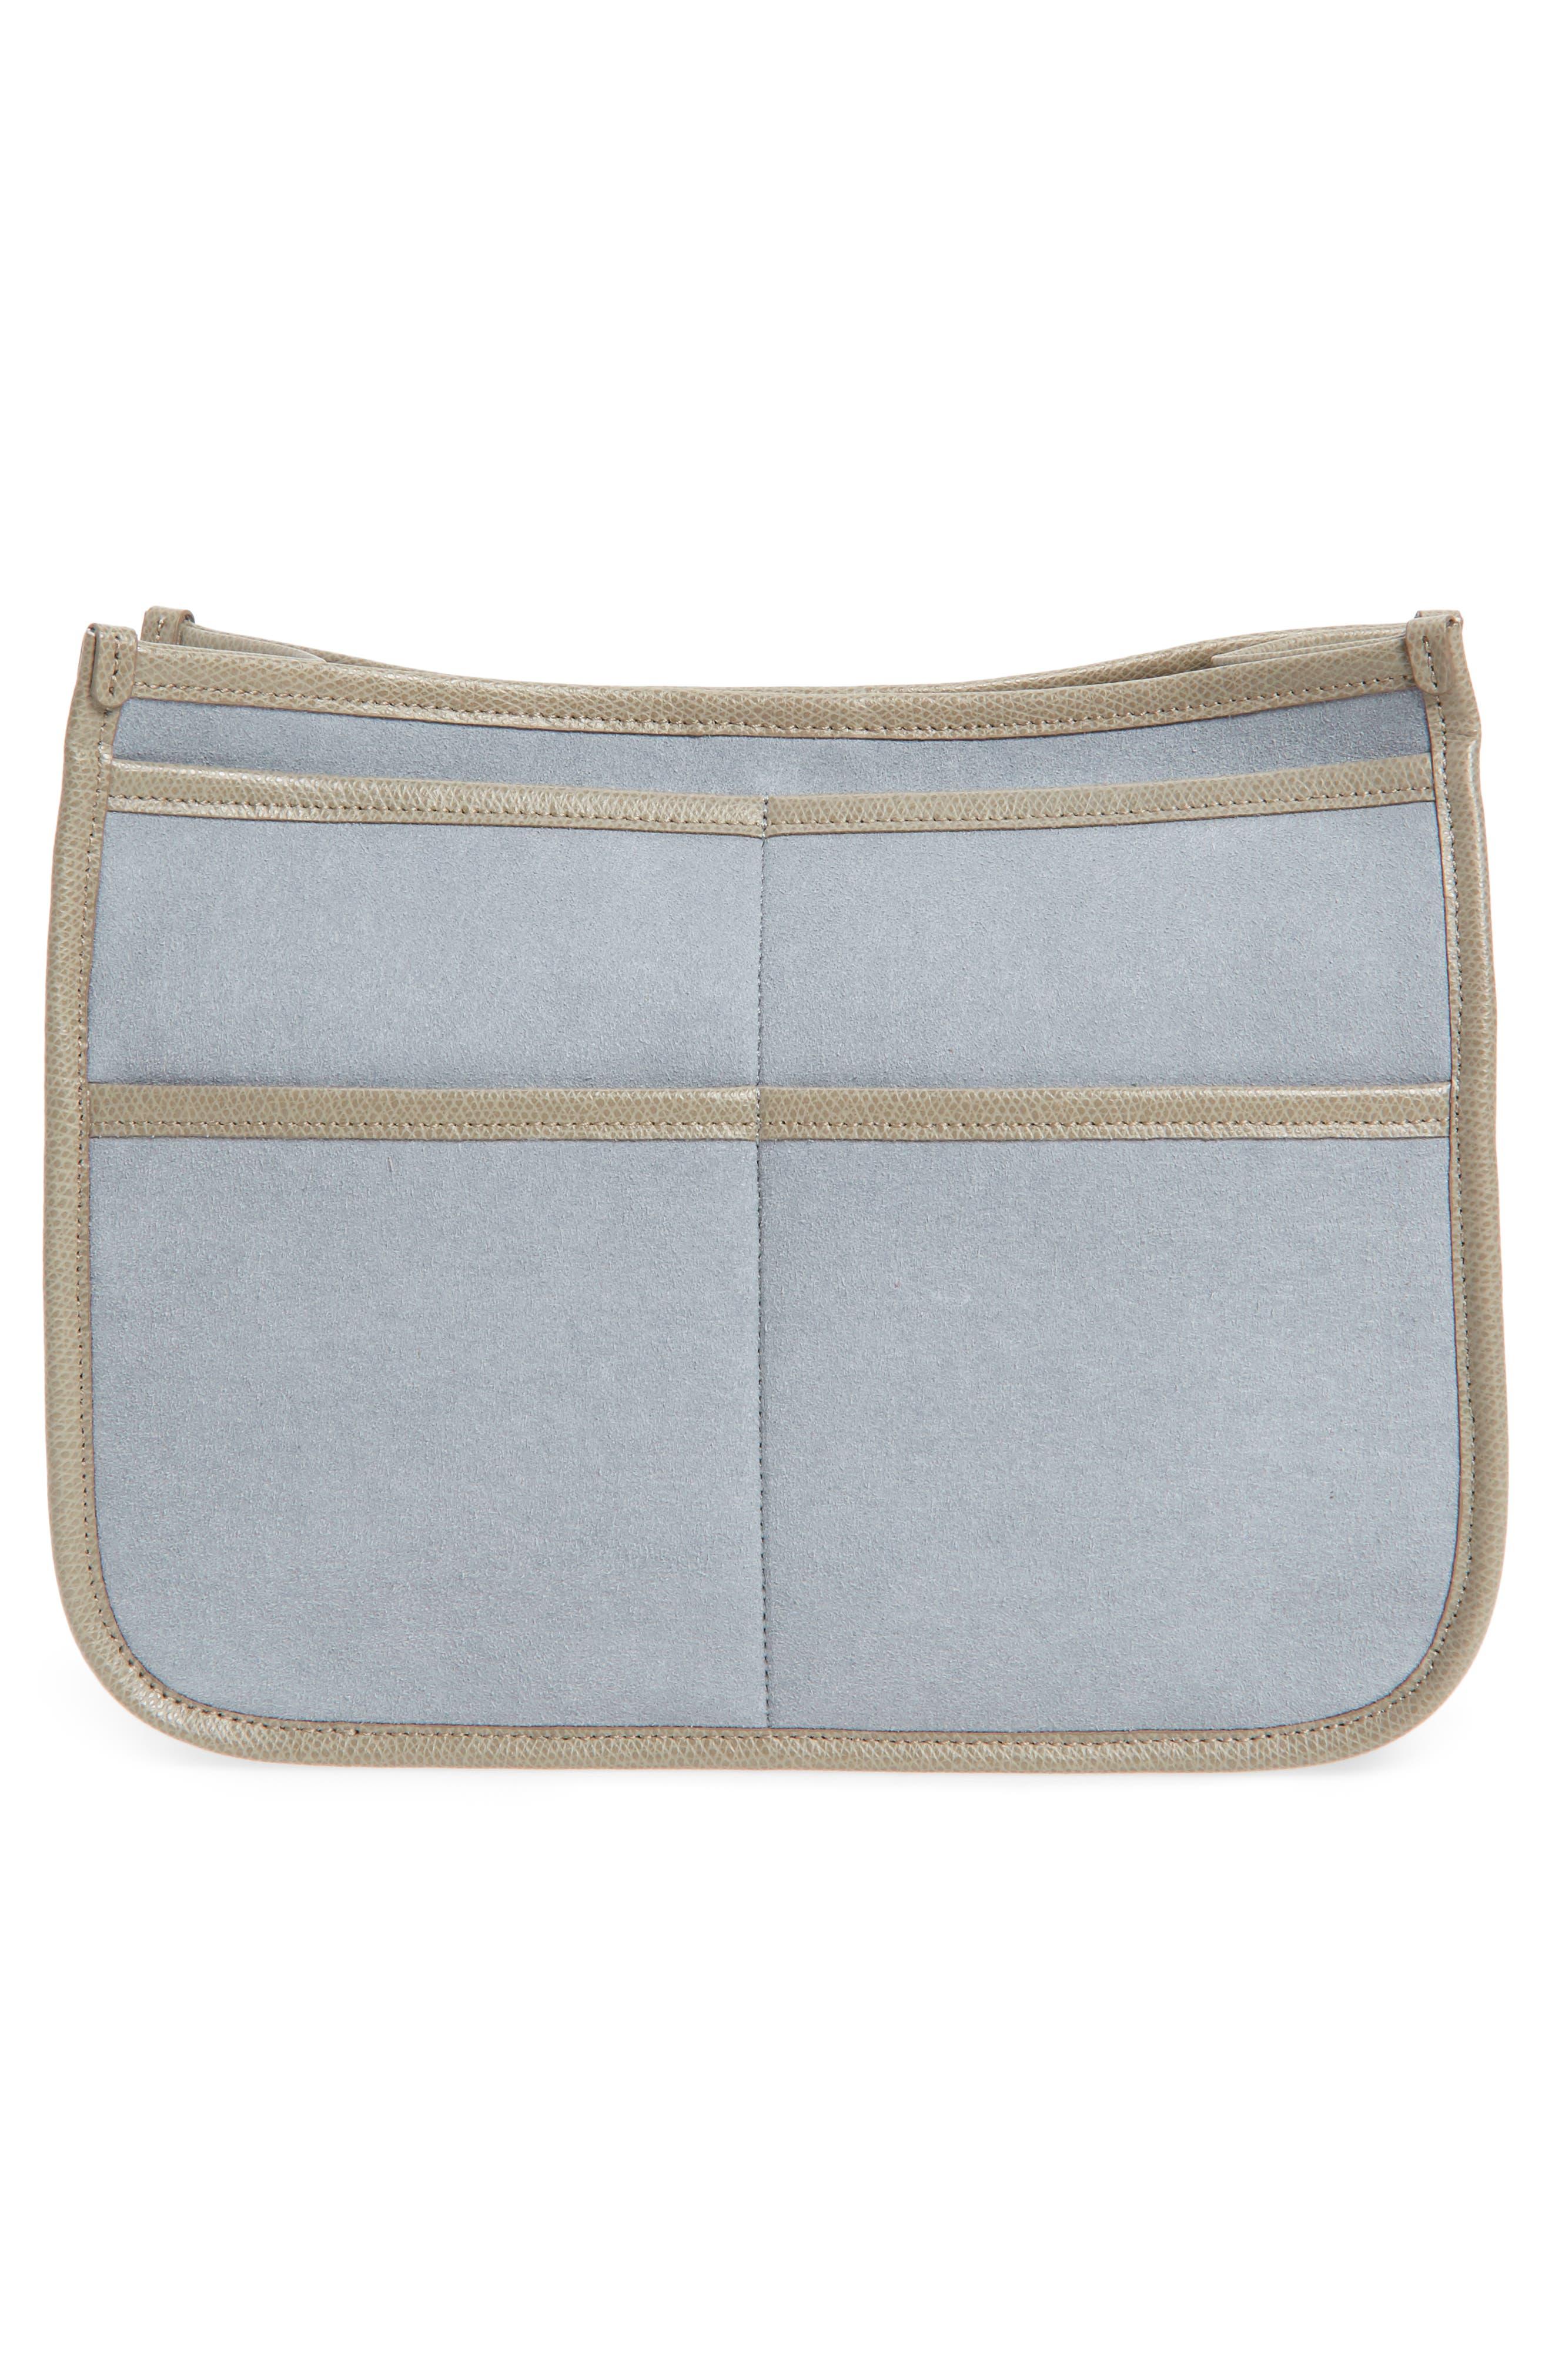 Caddy Microsuede Handbag Organizer,                             Alternate thumbnail 2, color,                             Sand